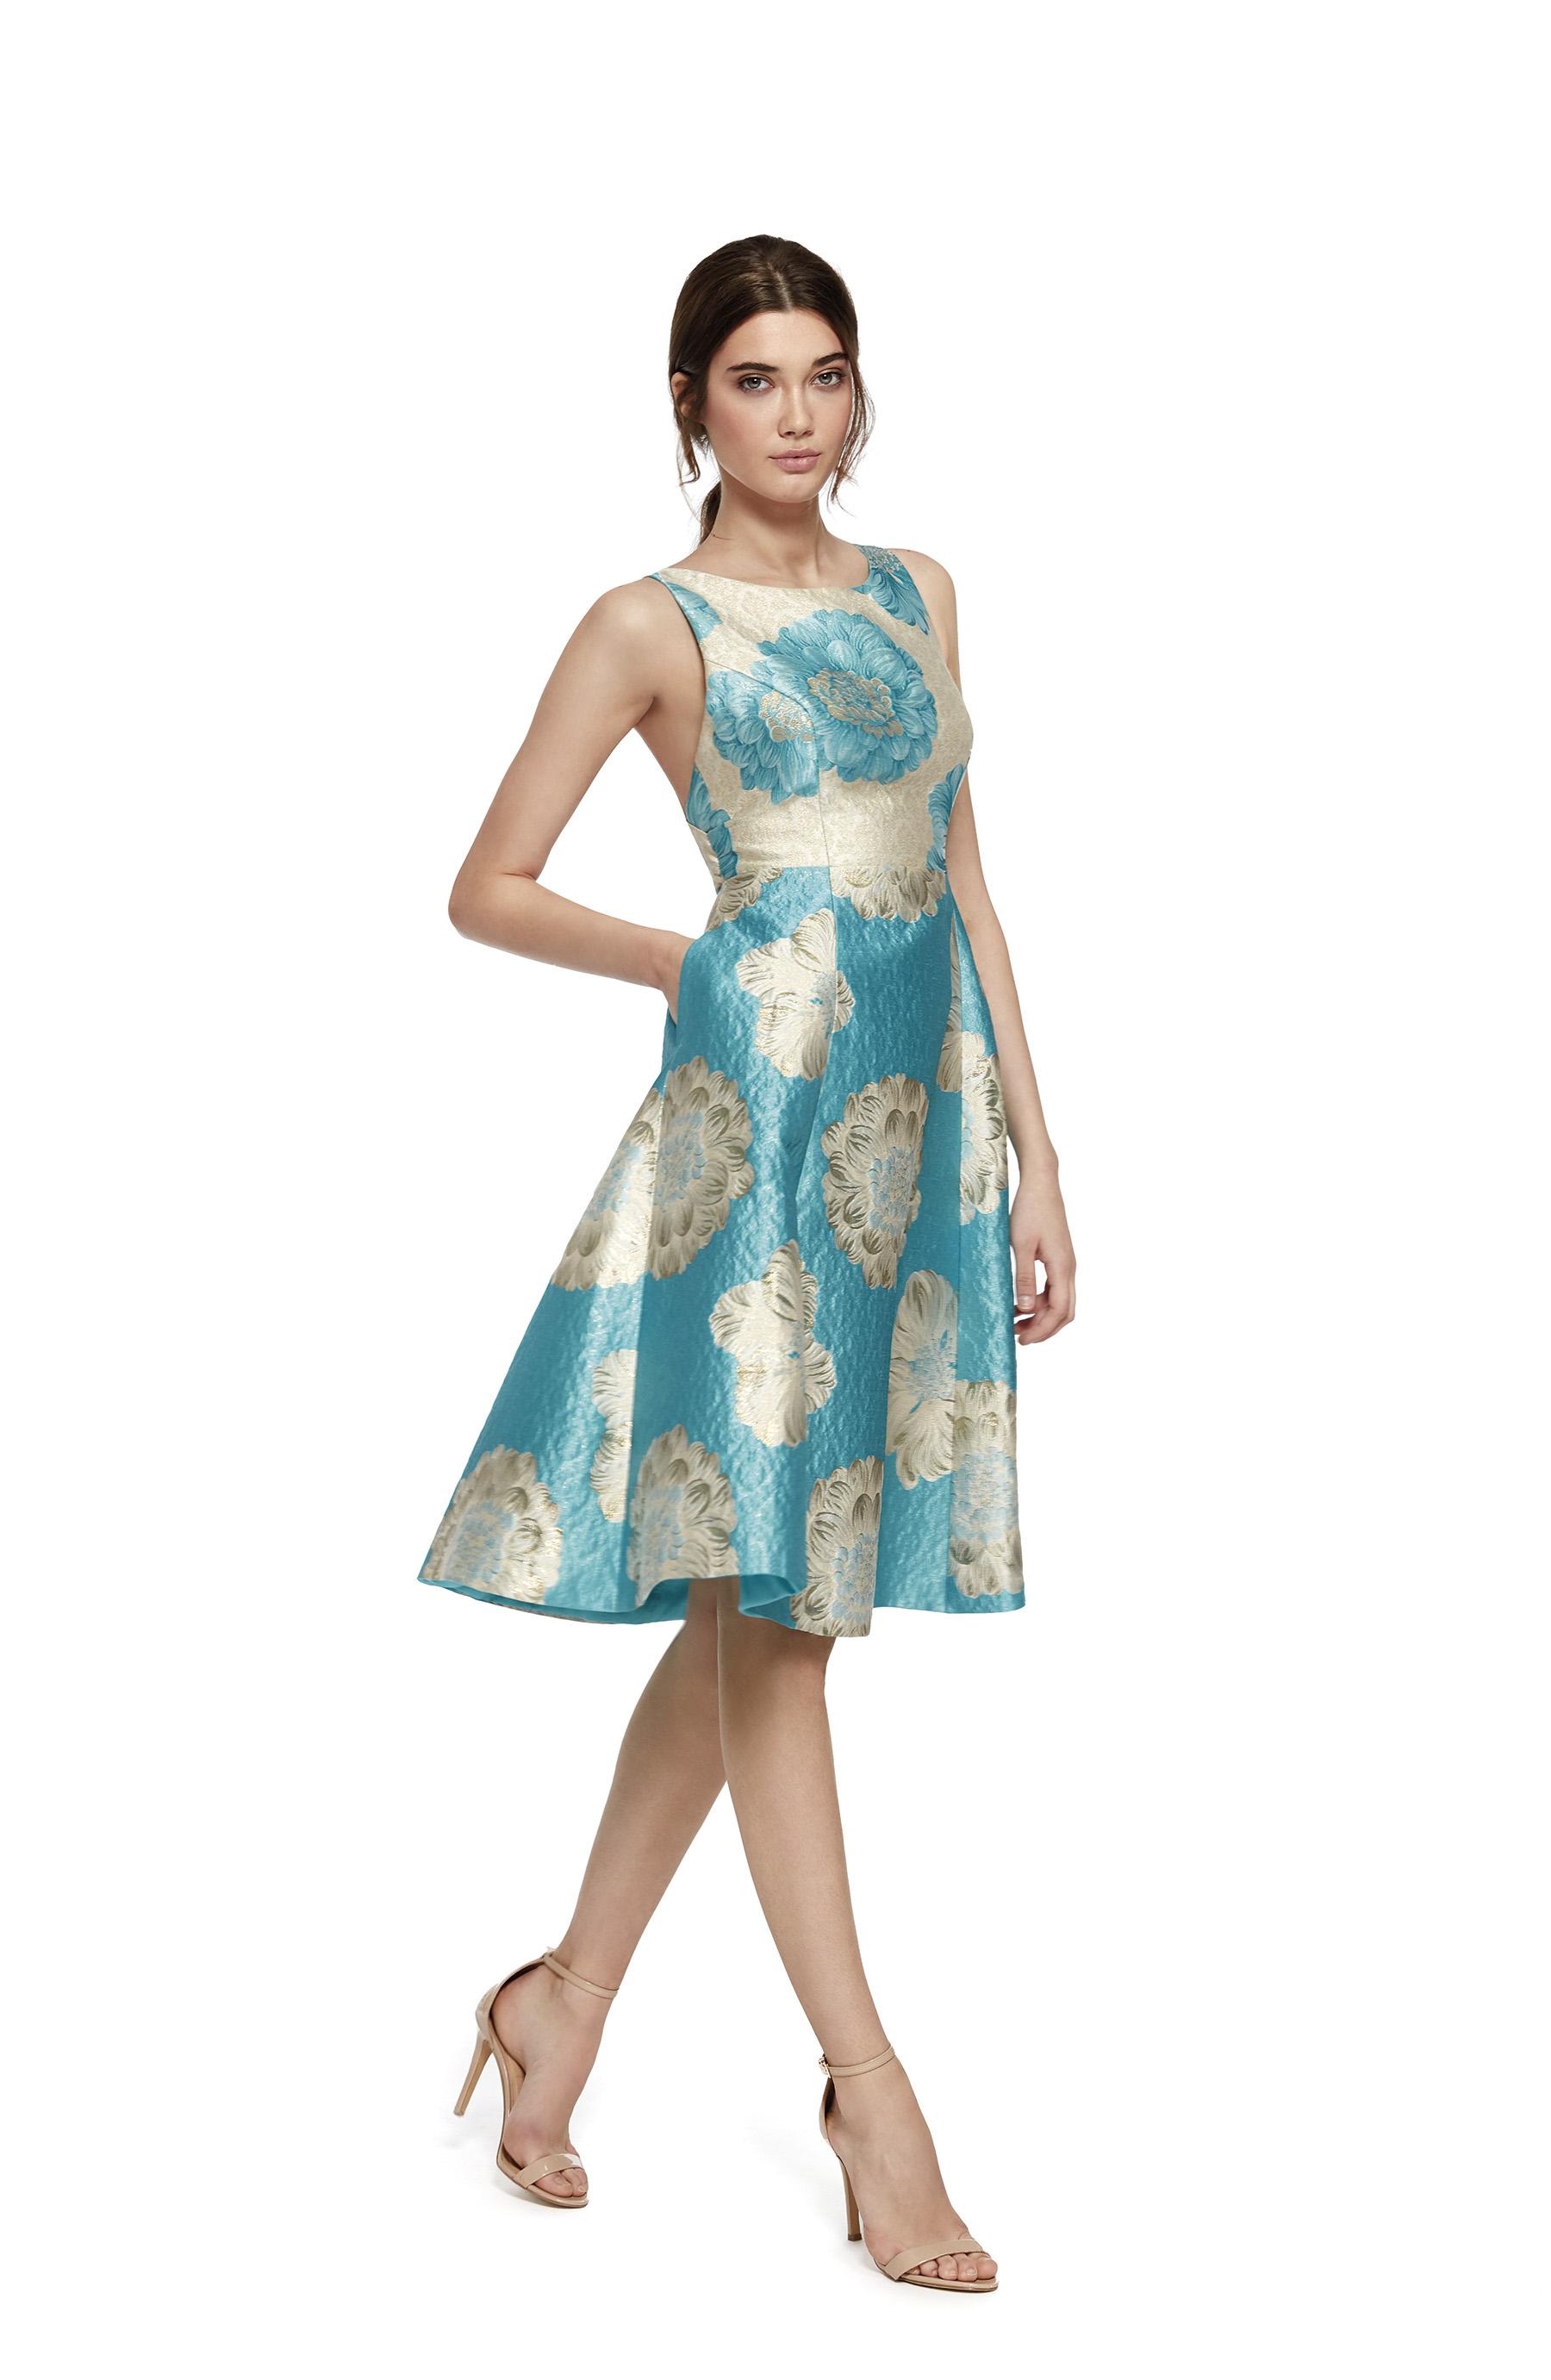 sale retailer entire collection wholesale online Carla Ruiz 94730 – Occasion Dress UK 6/8